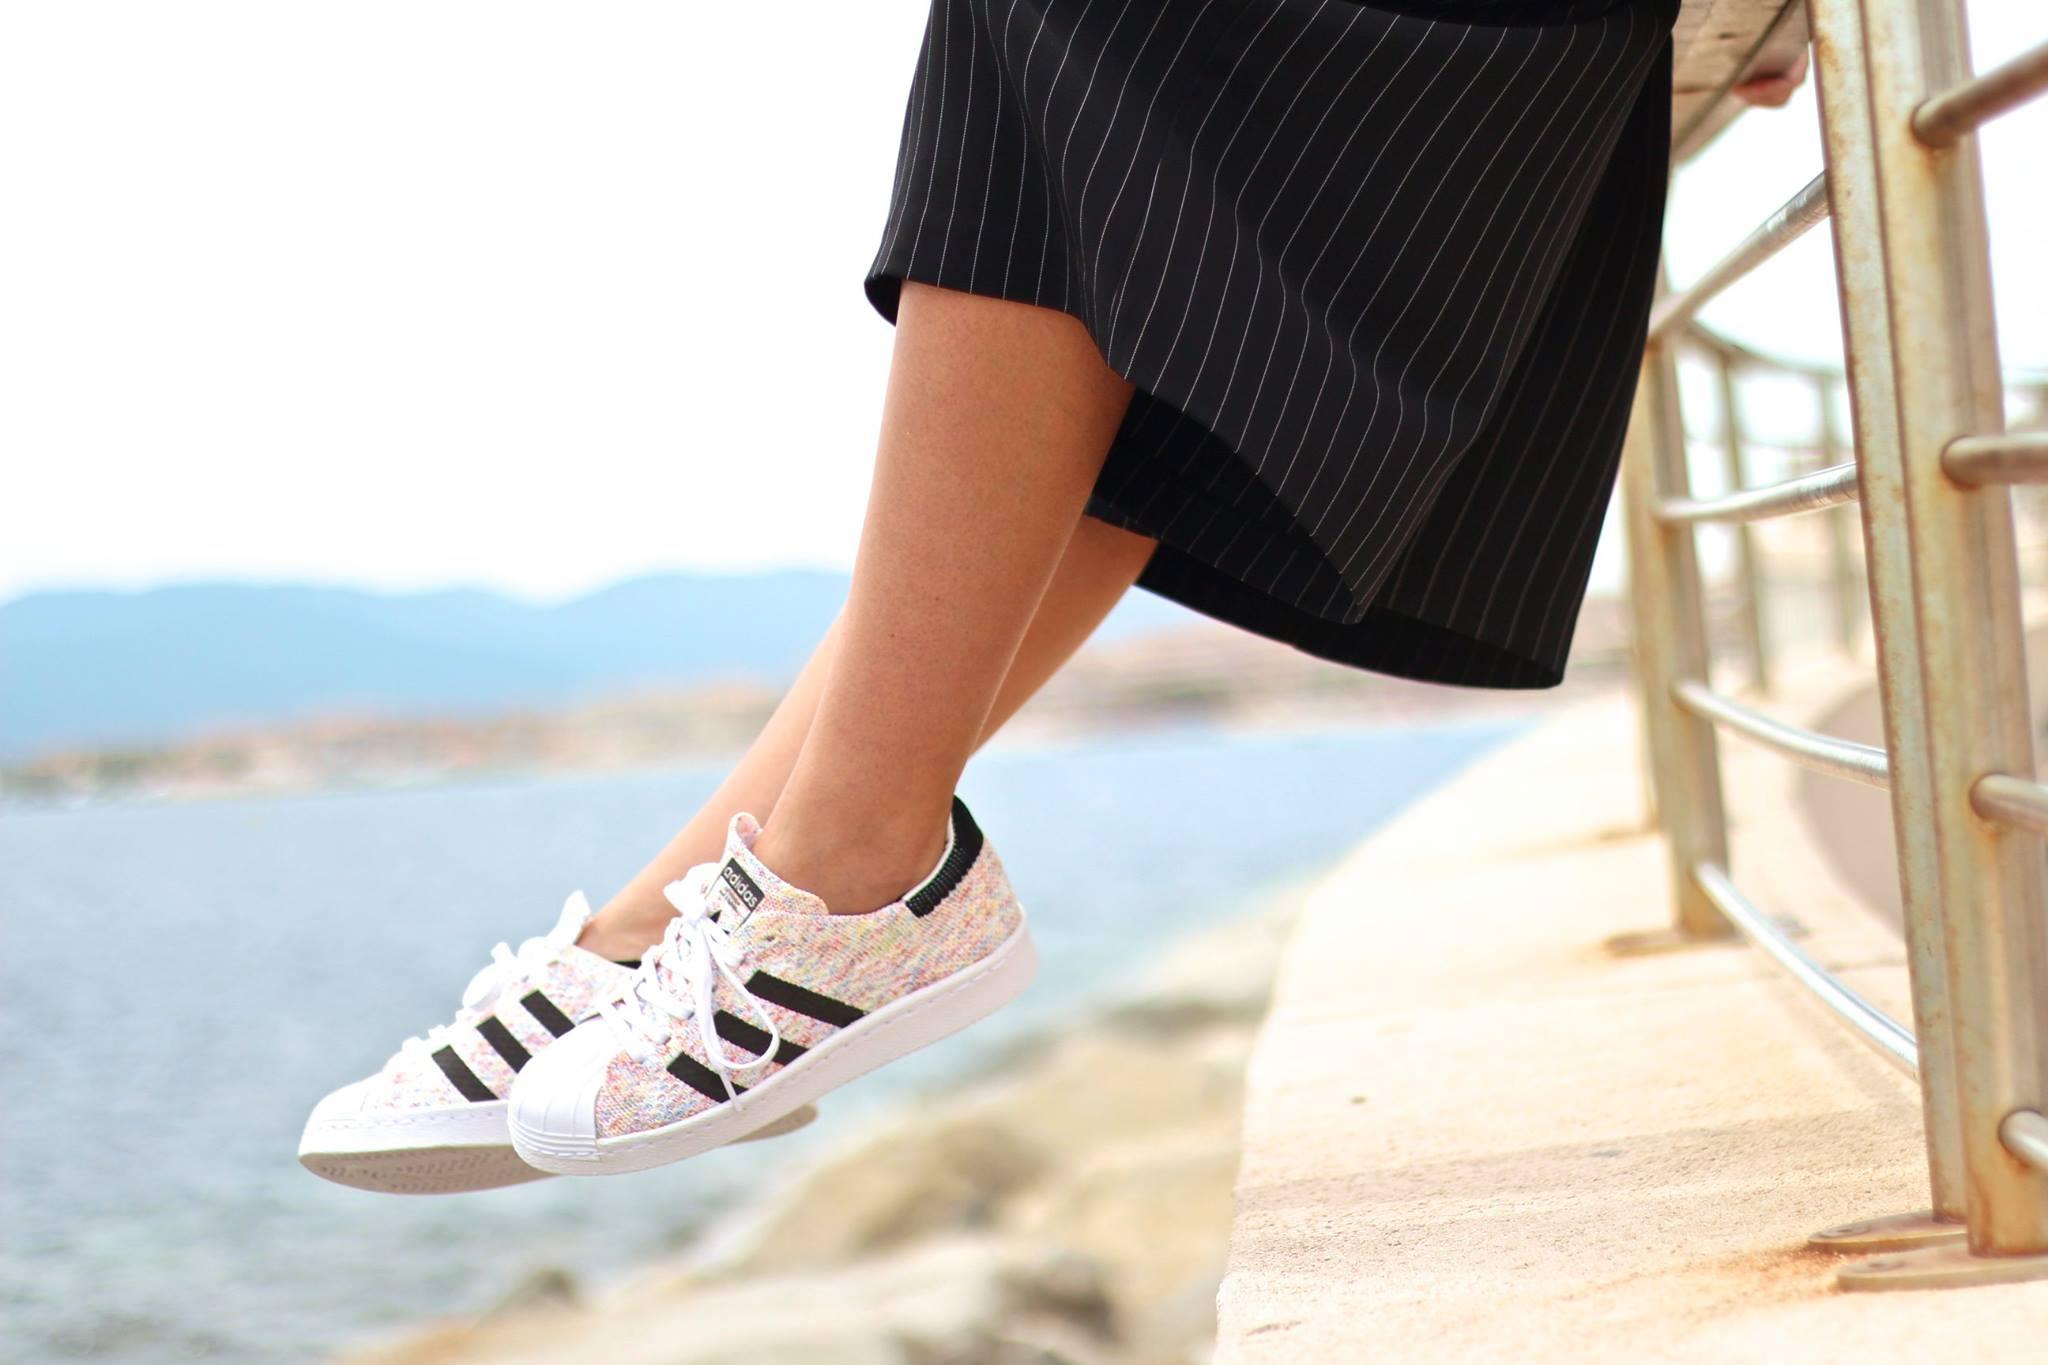 Marie Prevot - adidas Superstar 80's Primeknit Multi